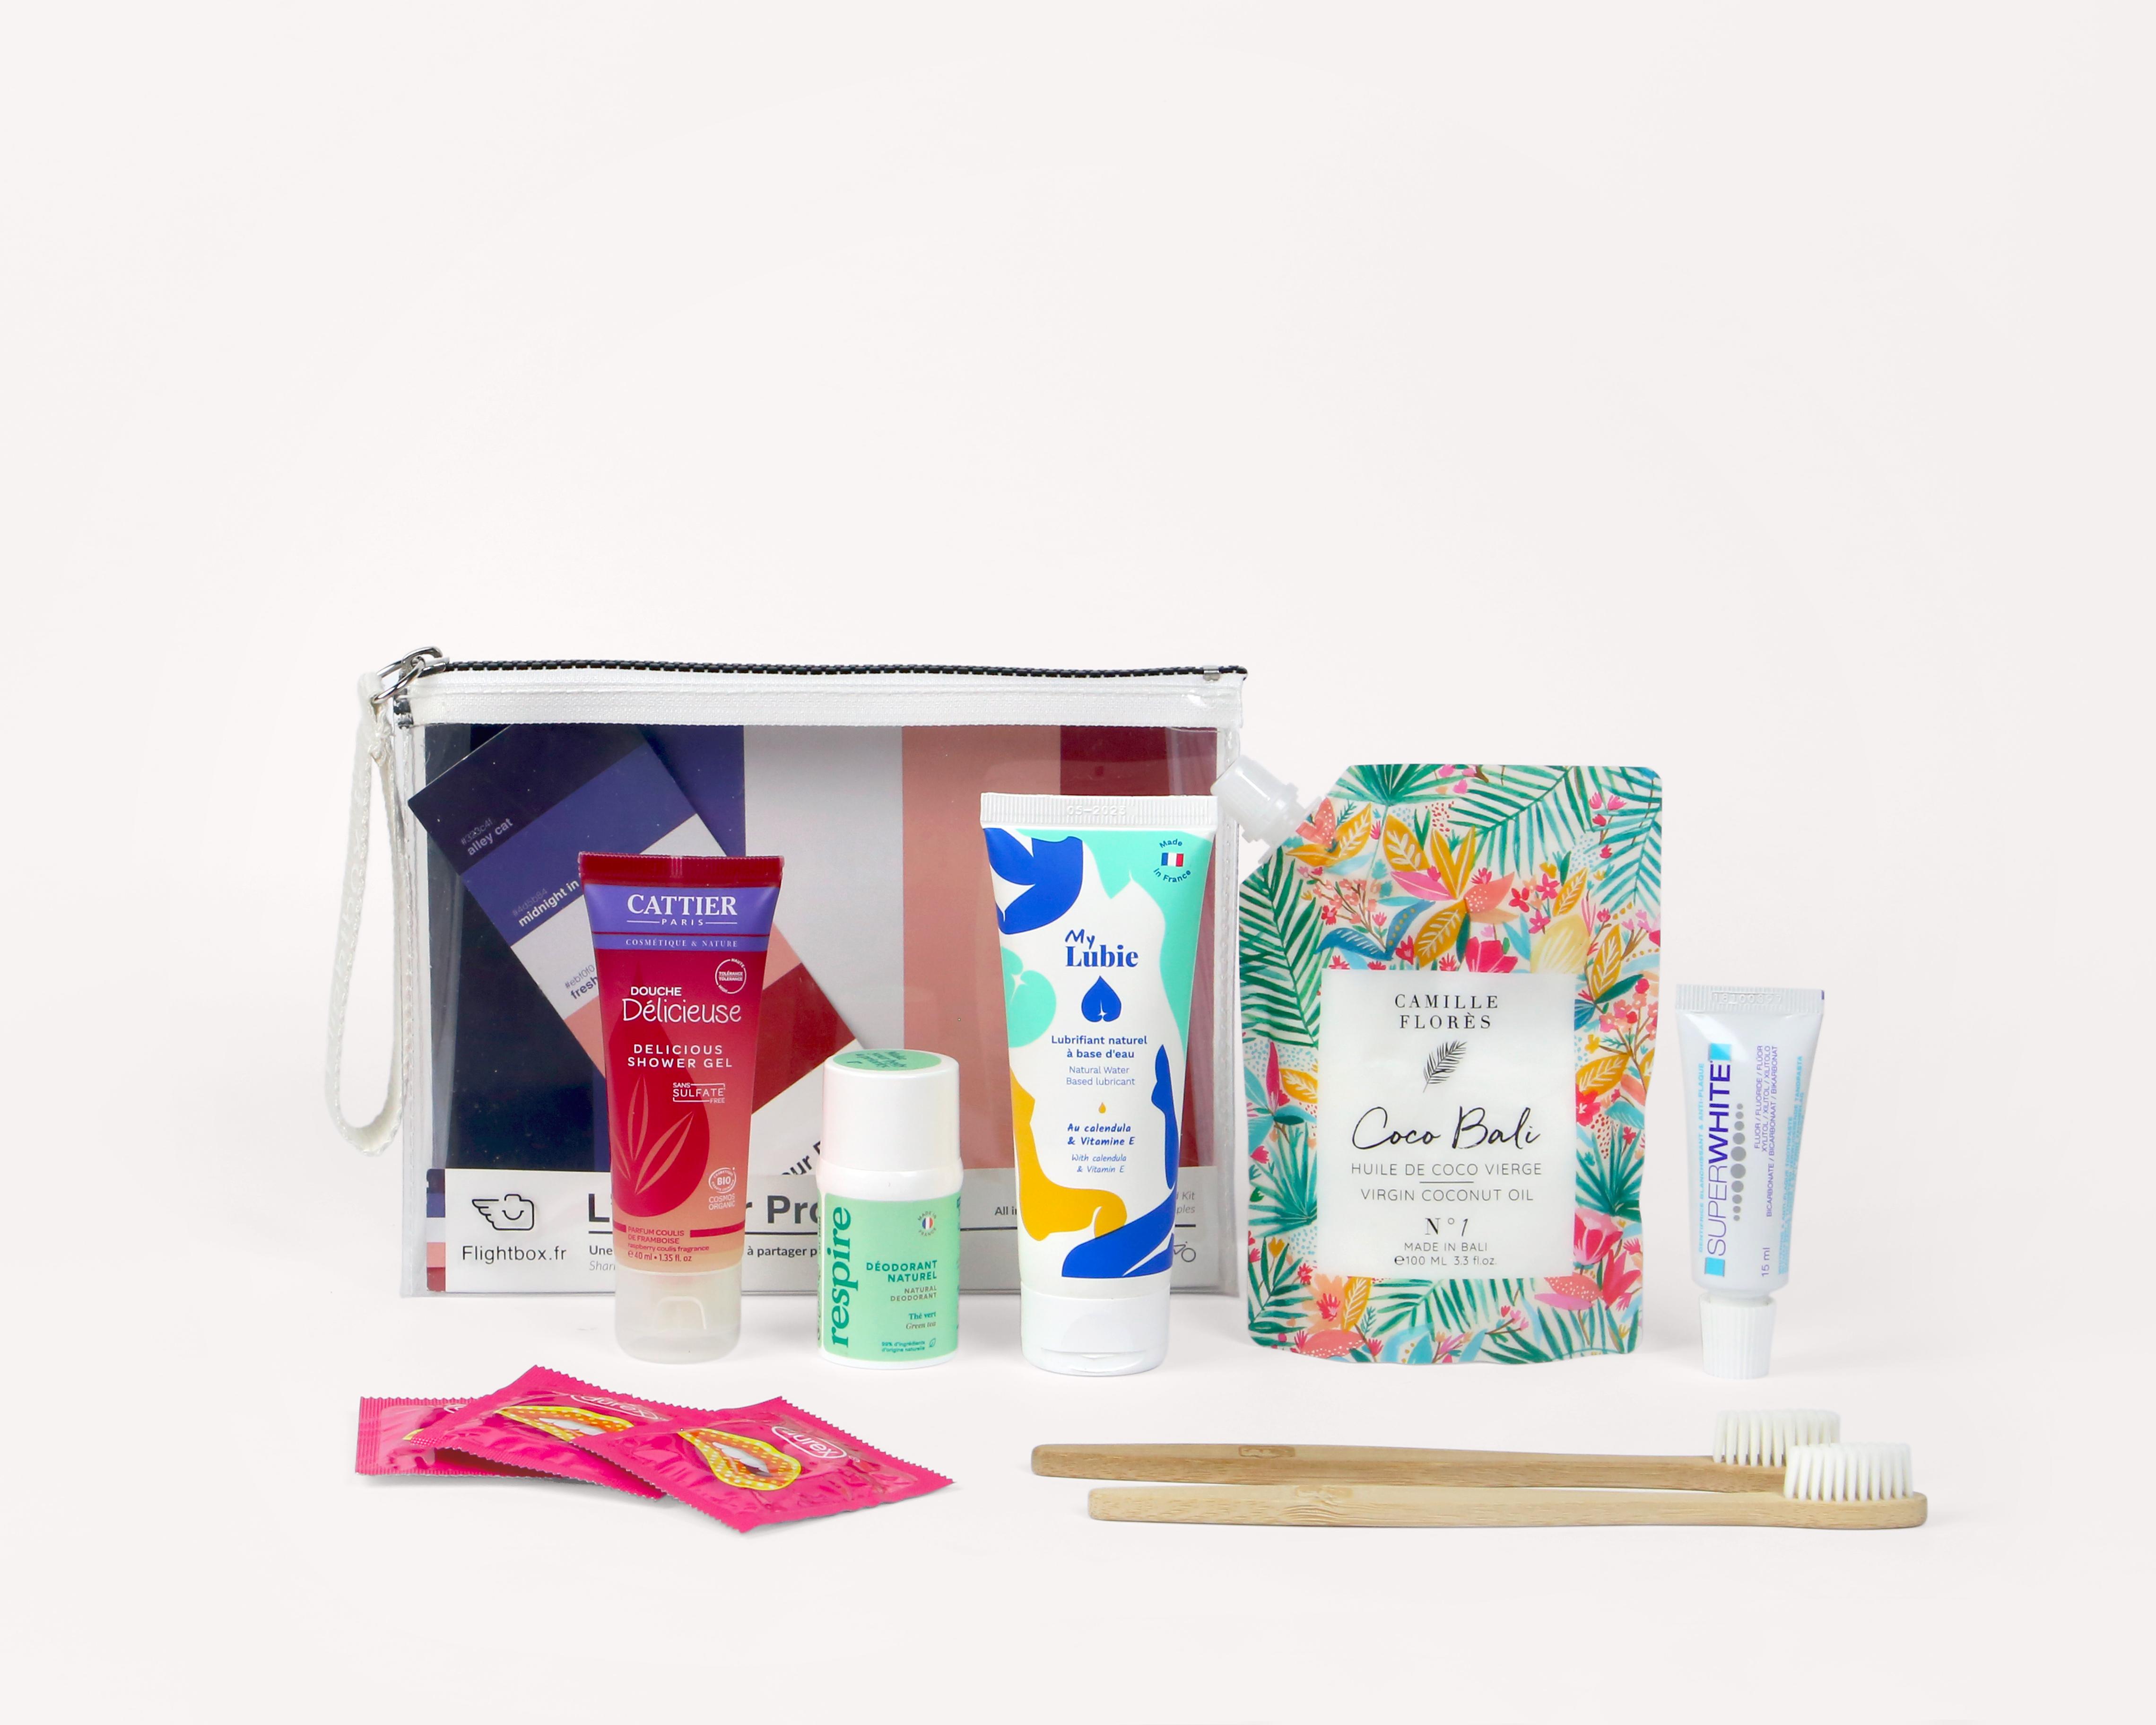 packshot_trousses_lamour_propre_unpacked (1)